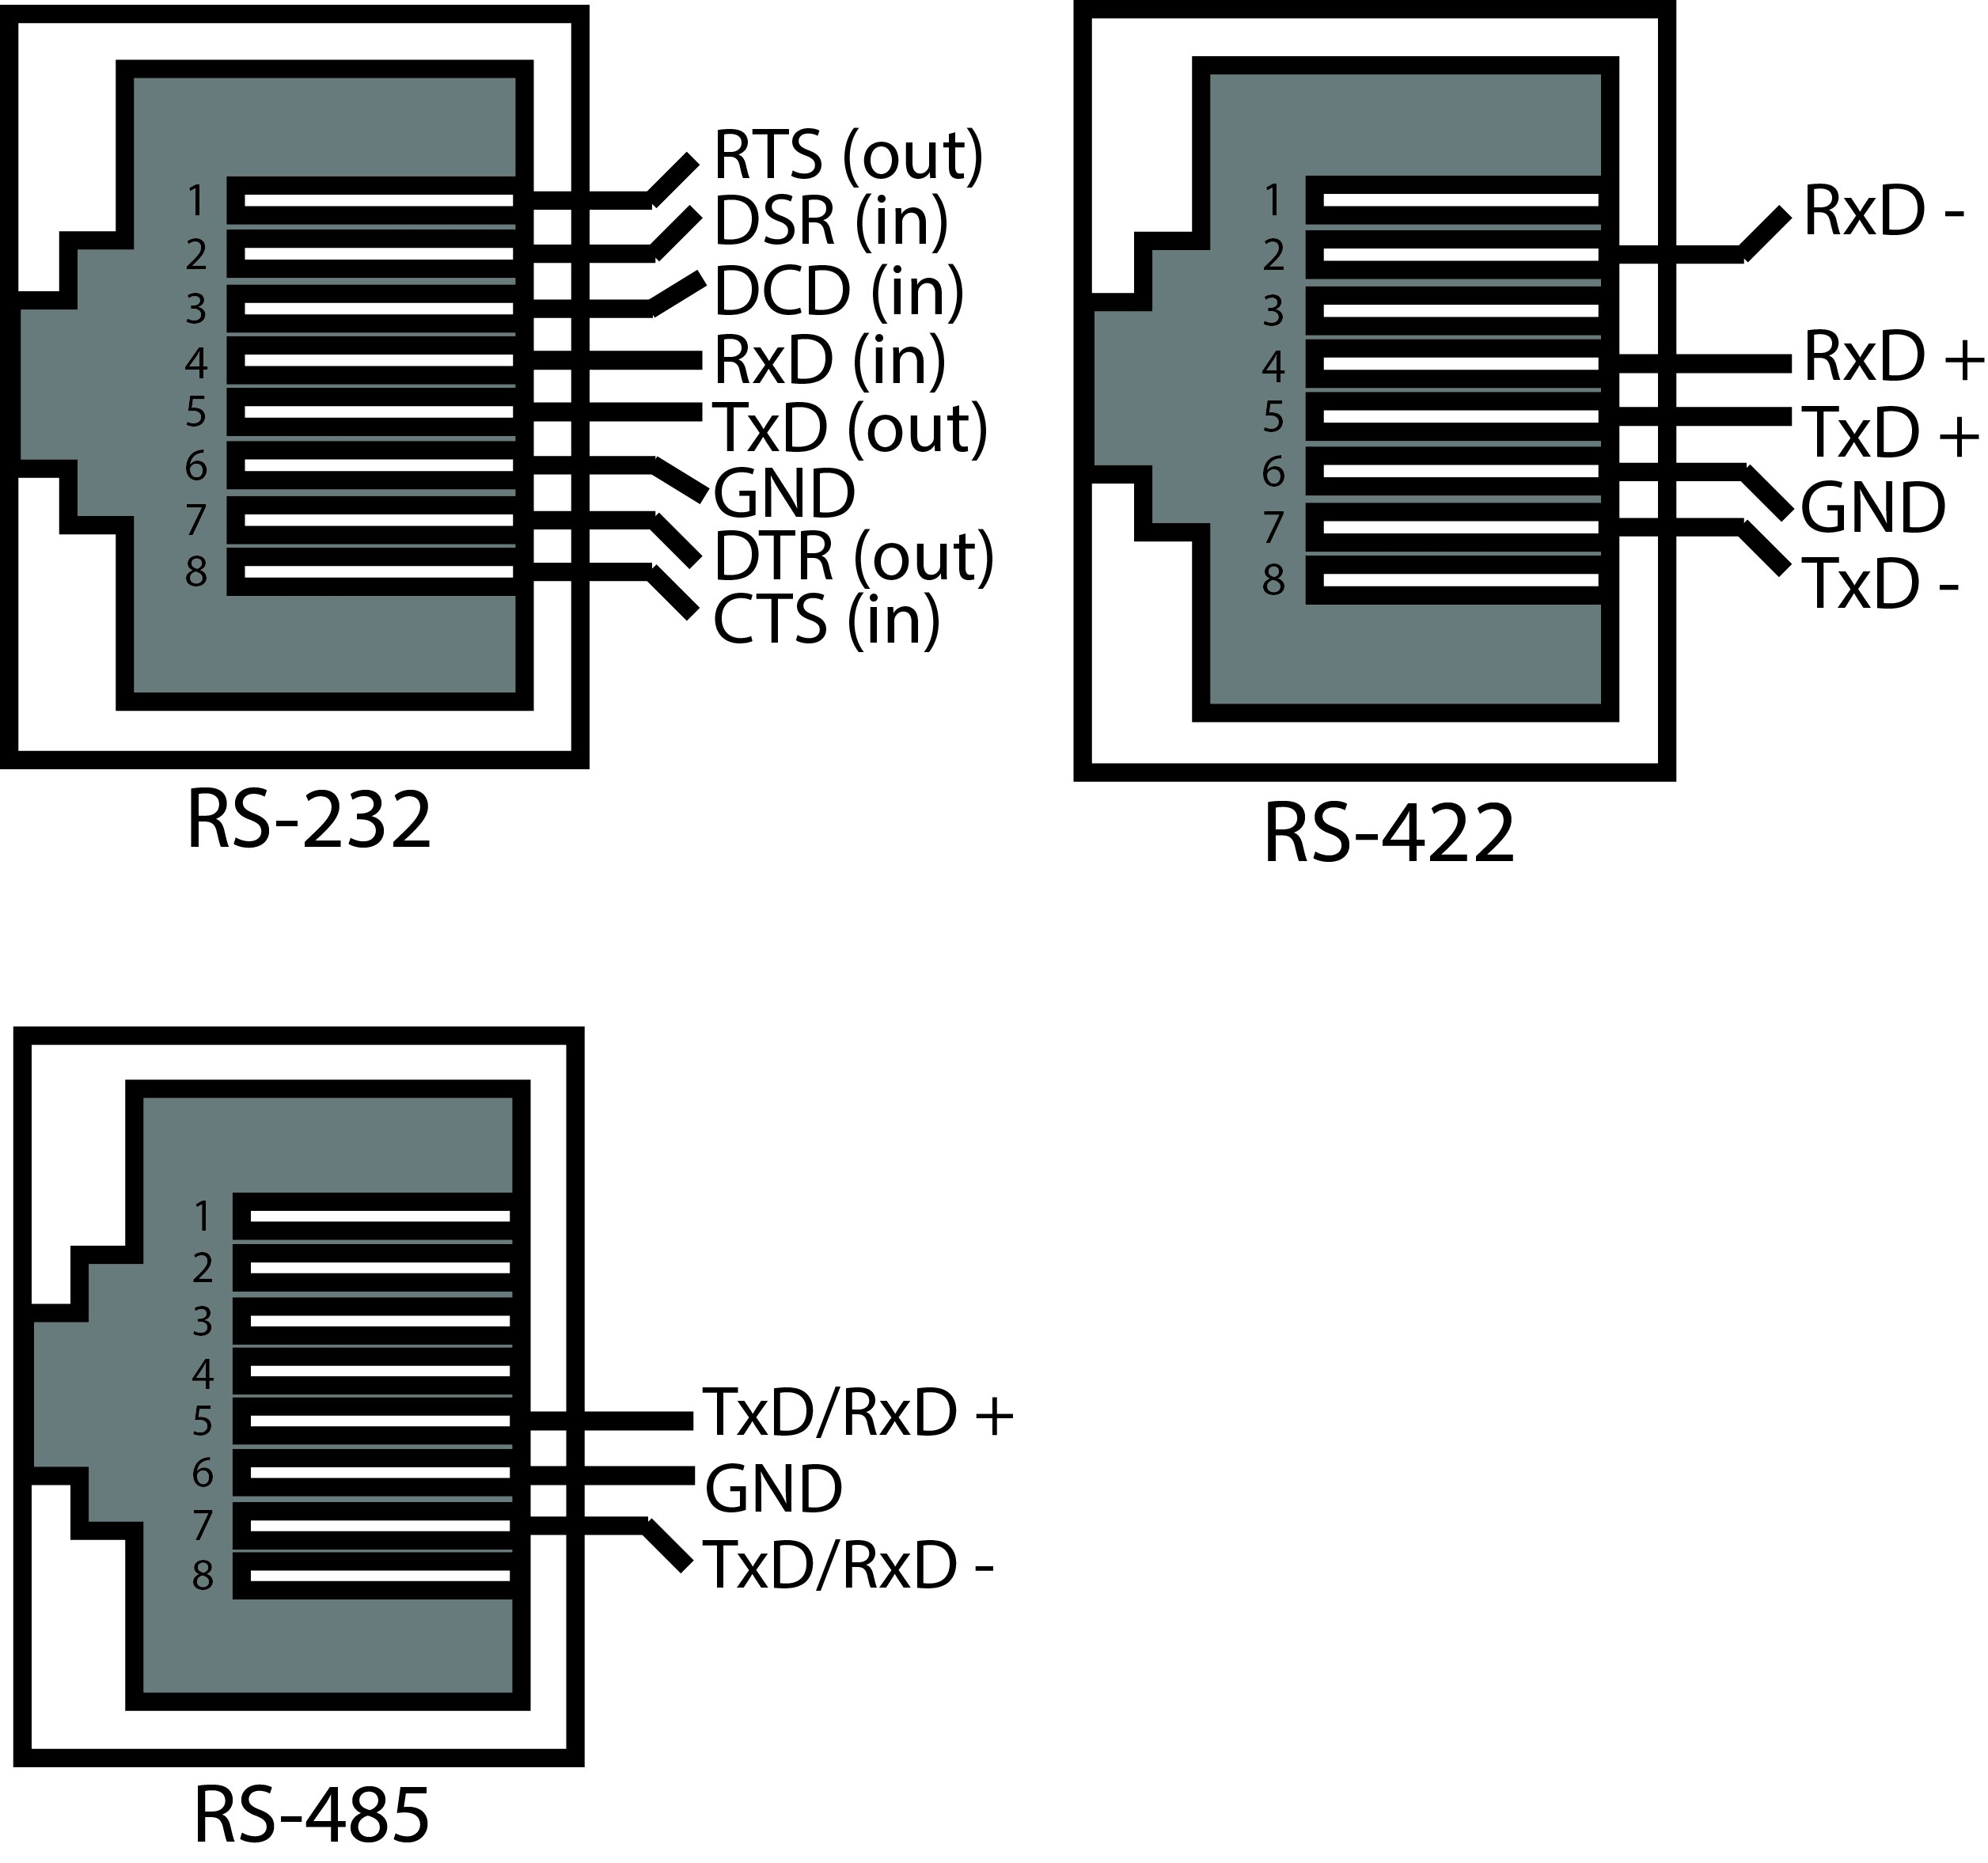 Honda Cx500 Wiring Diagram Moreover Honda Accord Wiring Diagram On